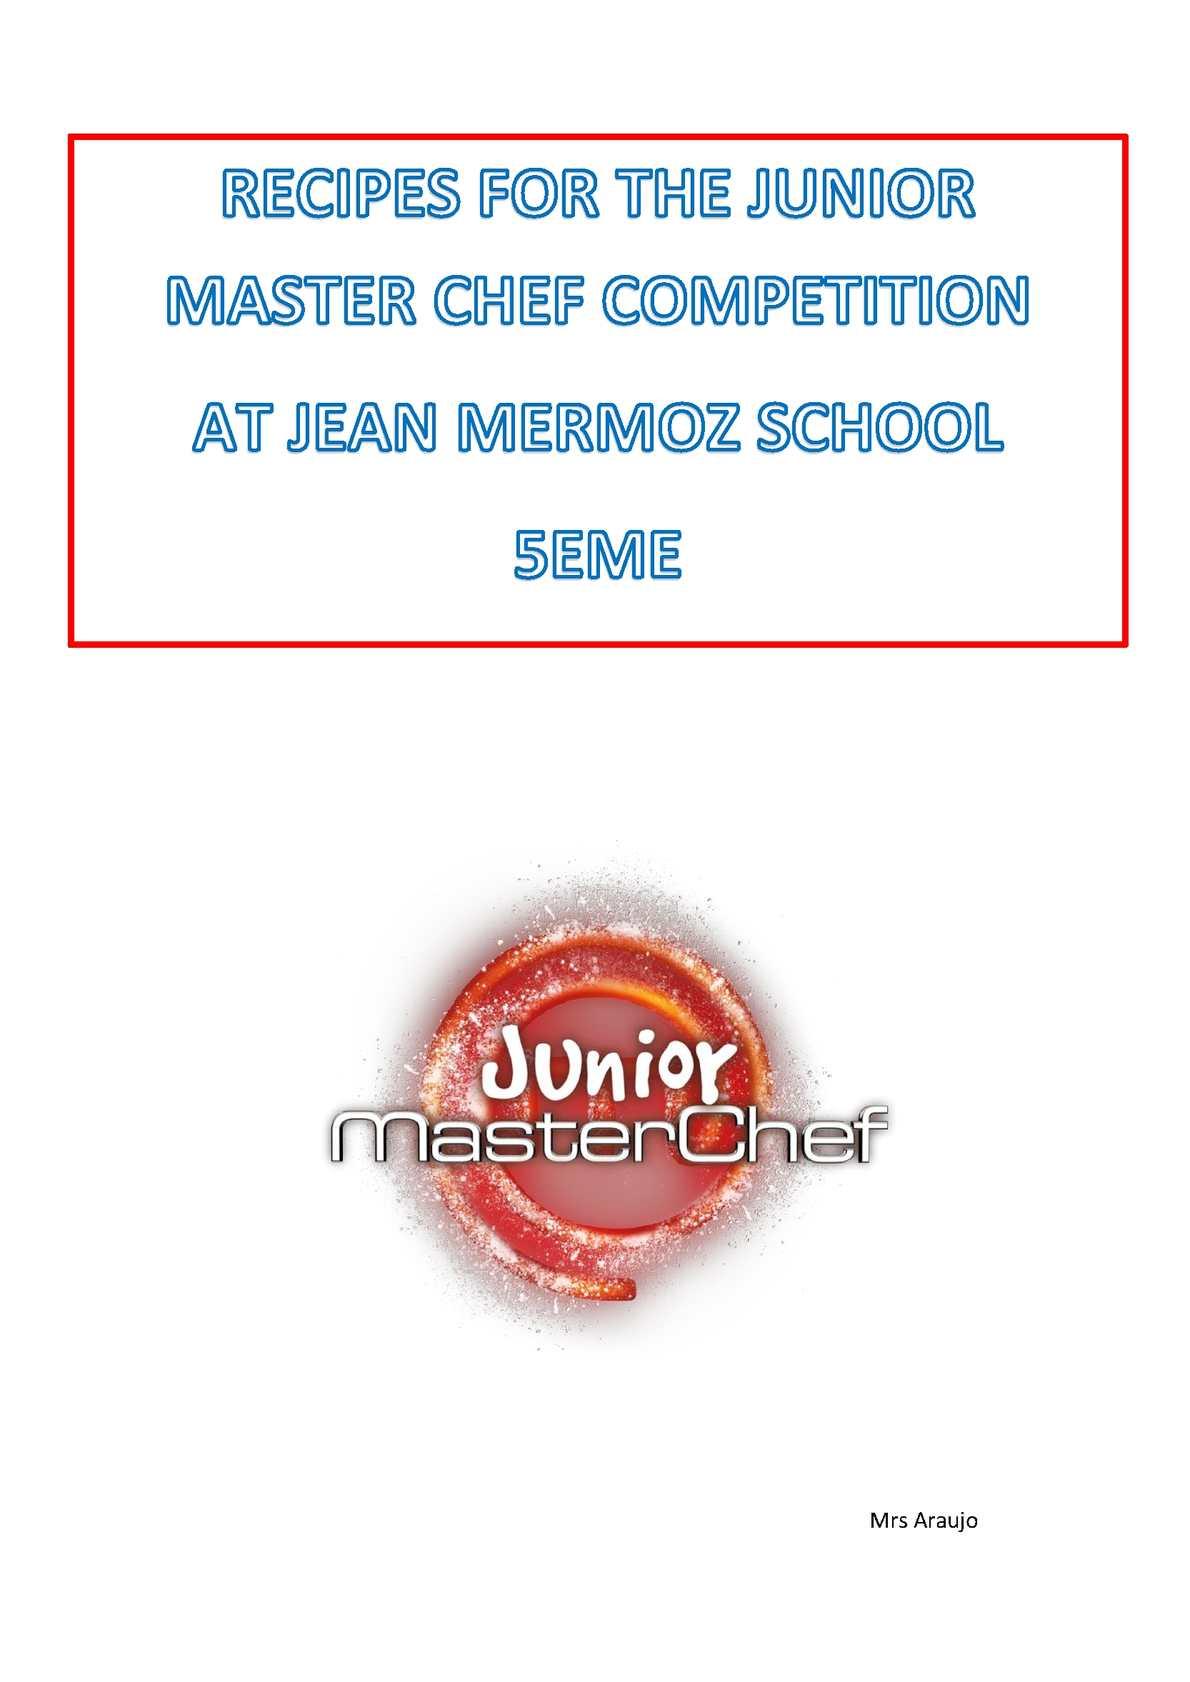 JUNIOR MASTER CHEF RECIPES AT SCHOOL